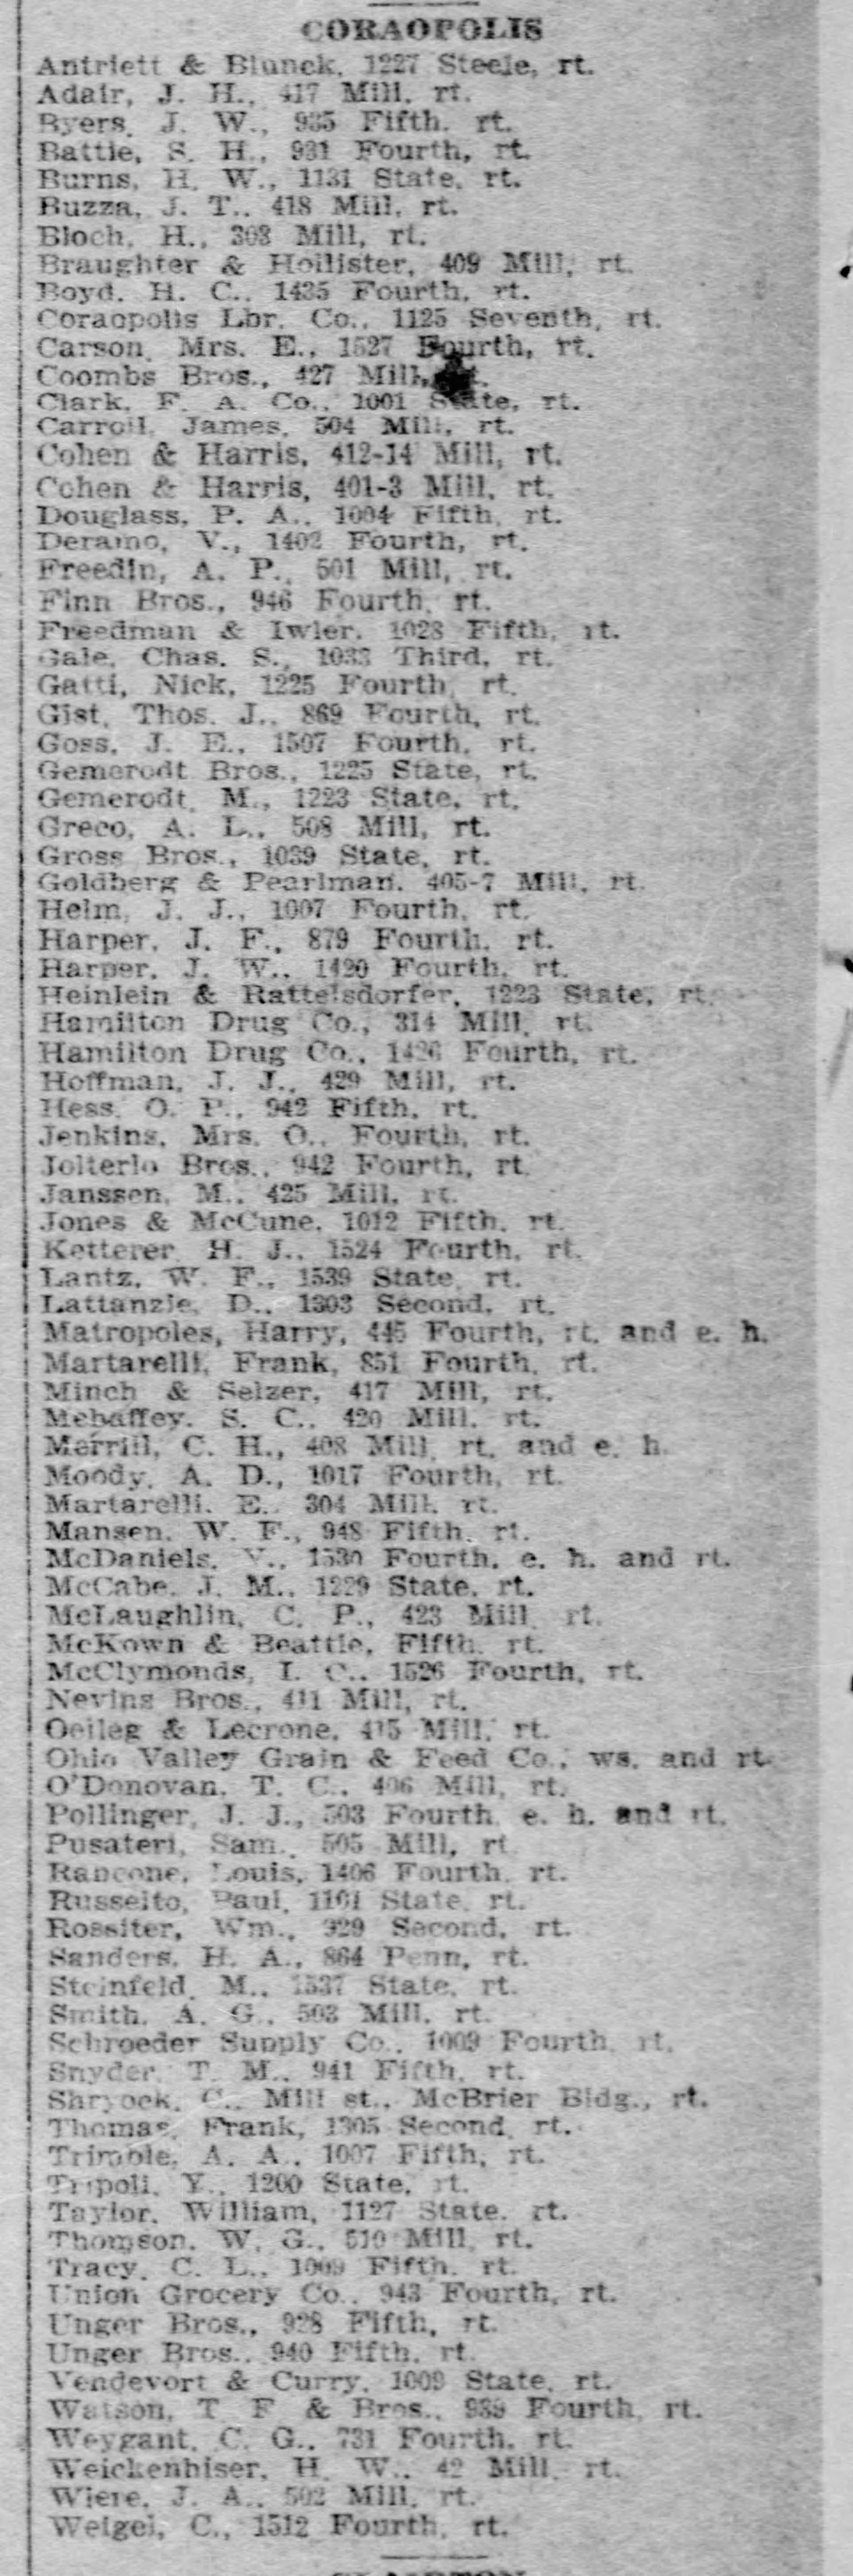 1909 - Pittsburgh_Post_Gazette_Thu__Apr_22__1909_(2).jpg